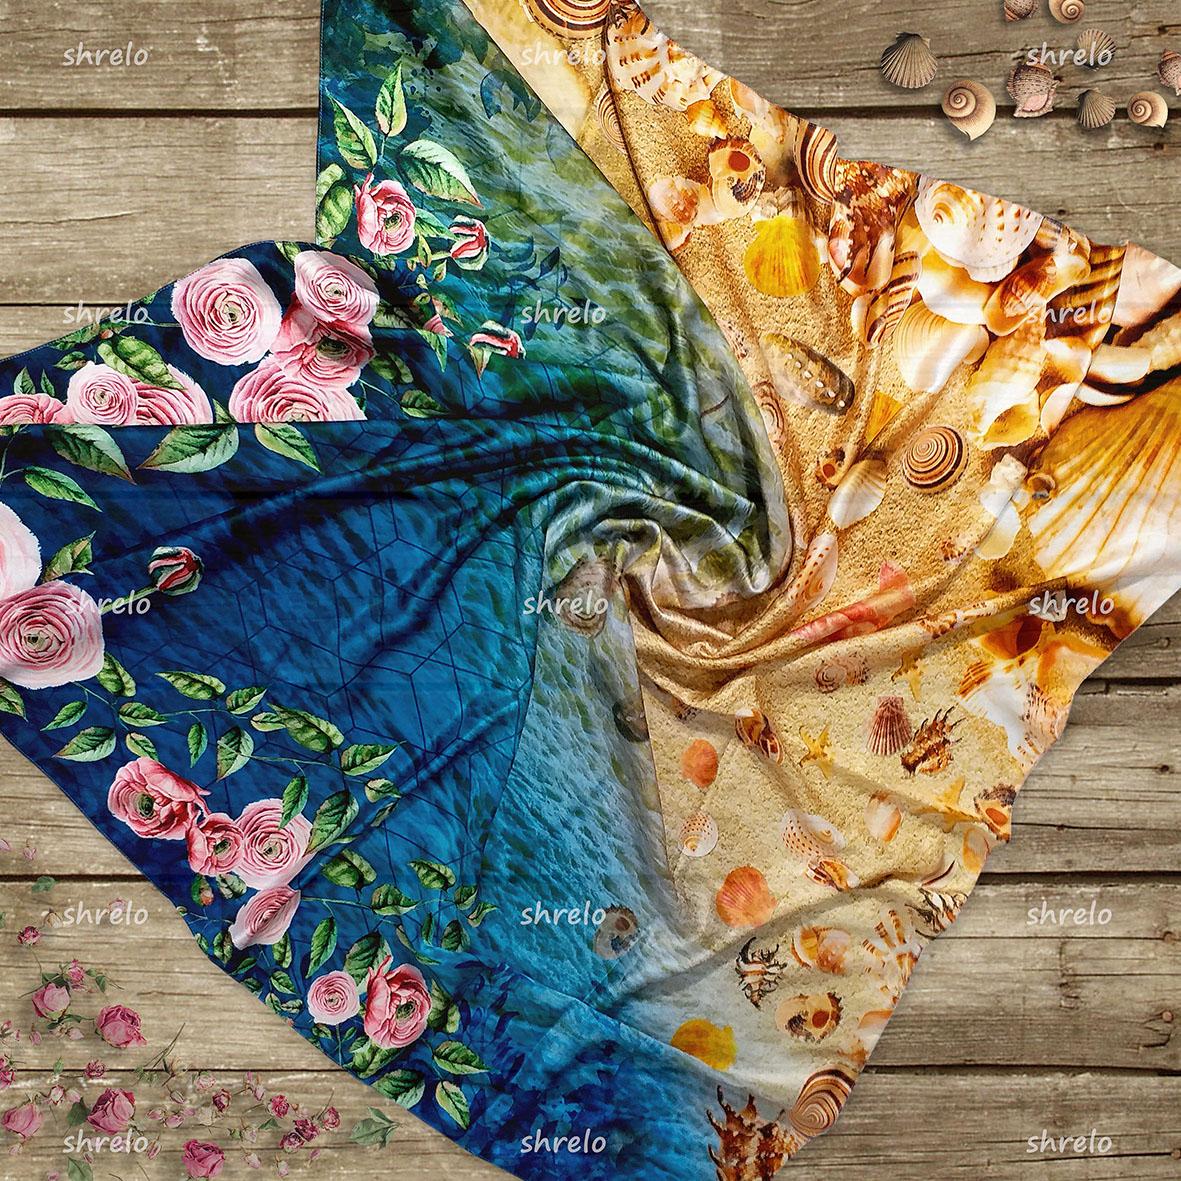 Shrelo Print Tekstil: Cara Membuat Hijab Printing, Jilbab Custom